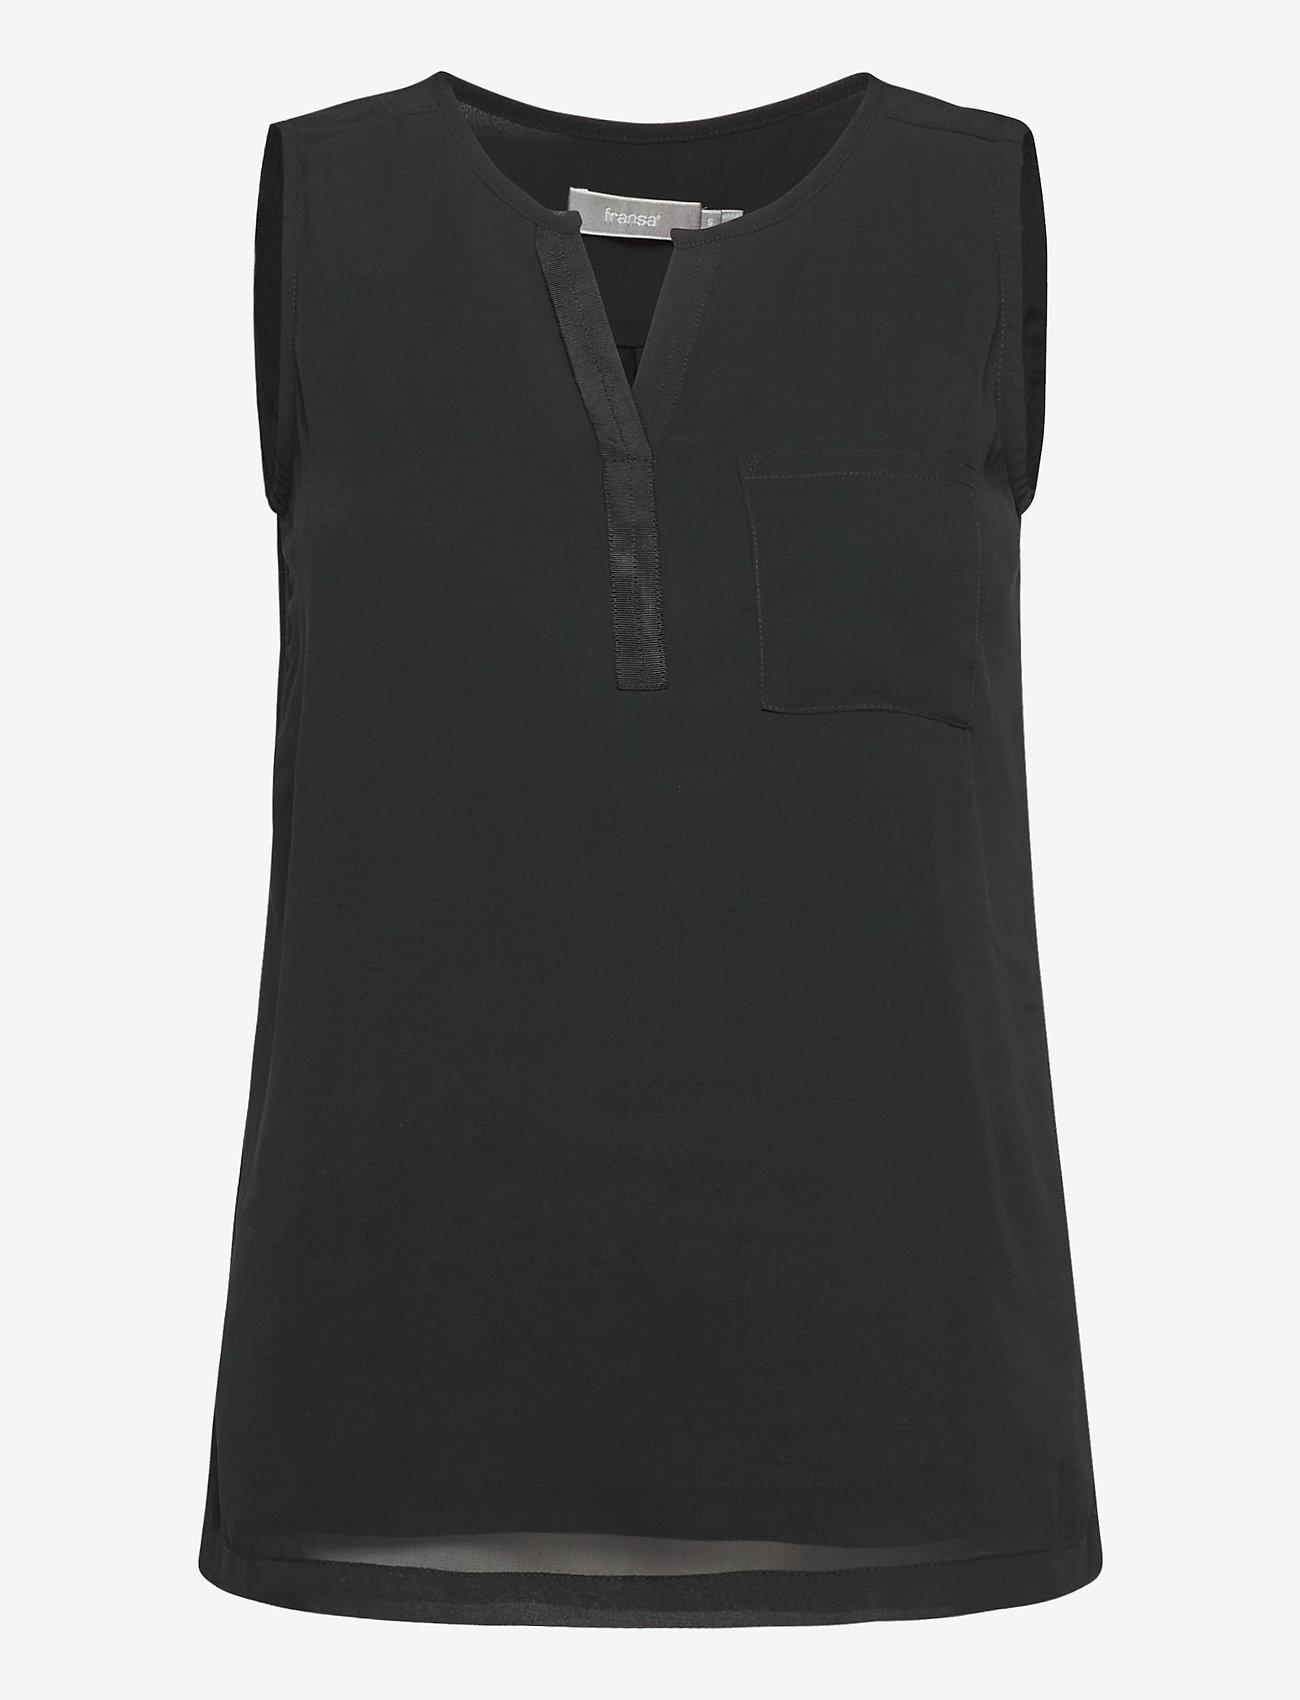 Fransa - Zawov 3 Top - sleeveless tops - black - 0